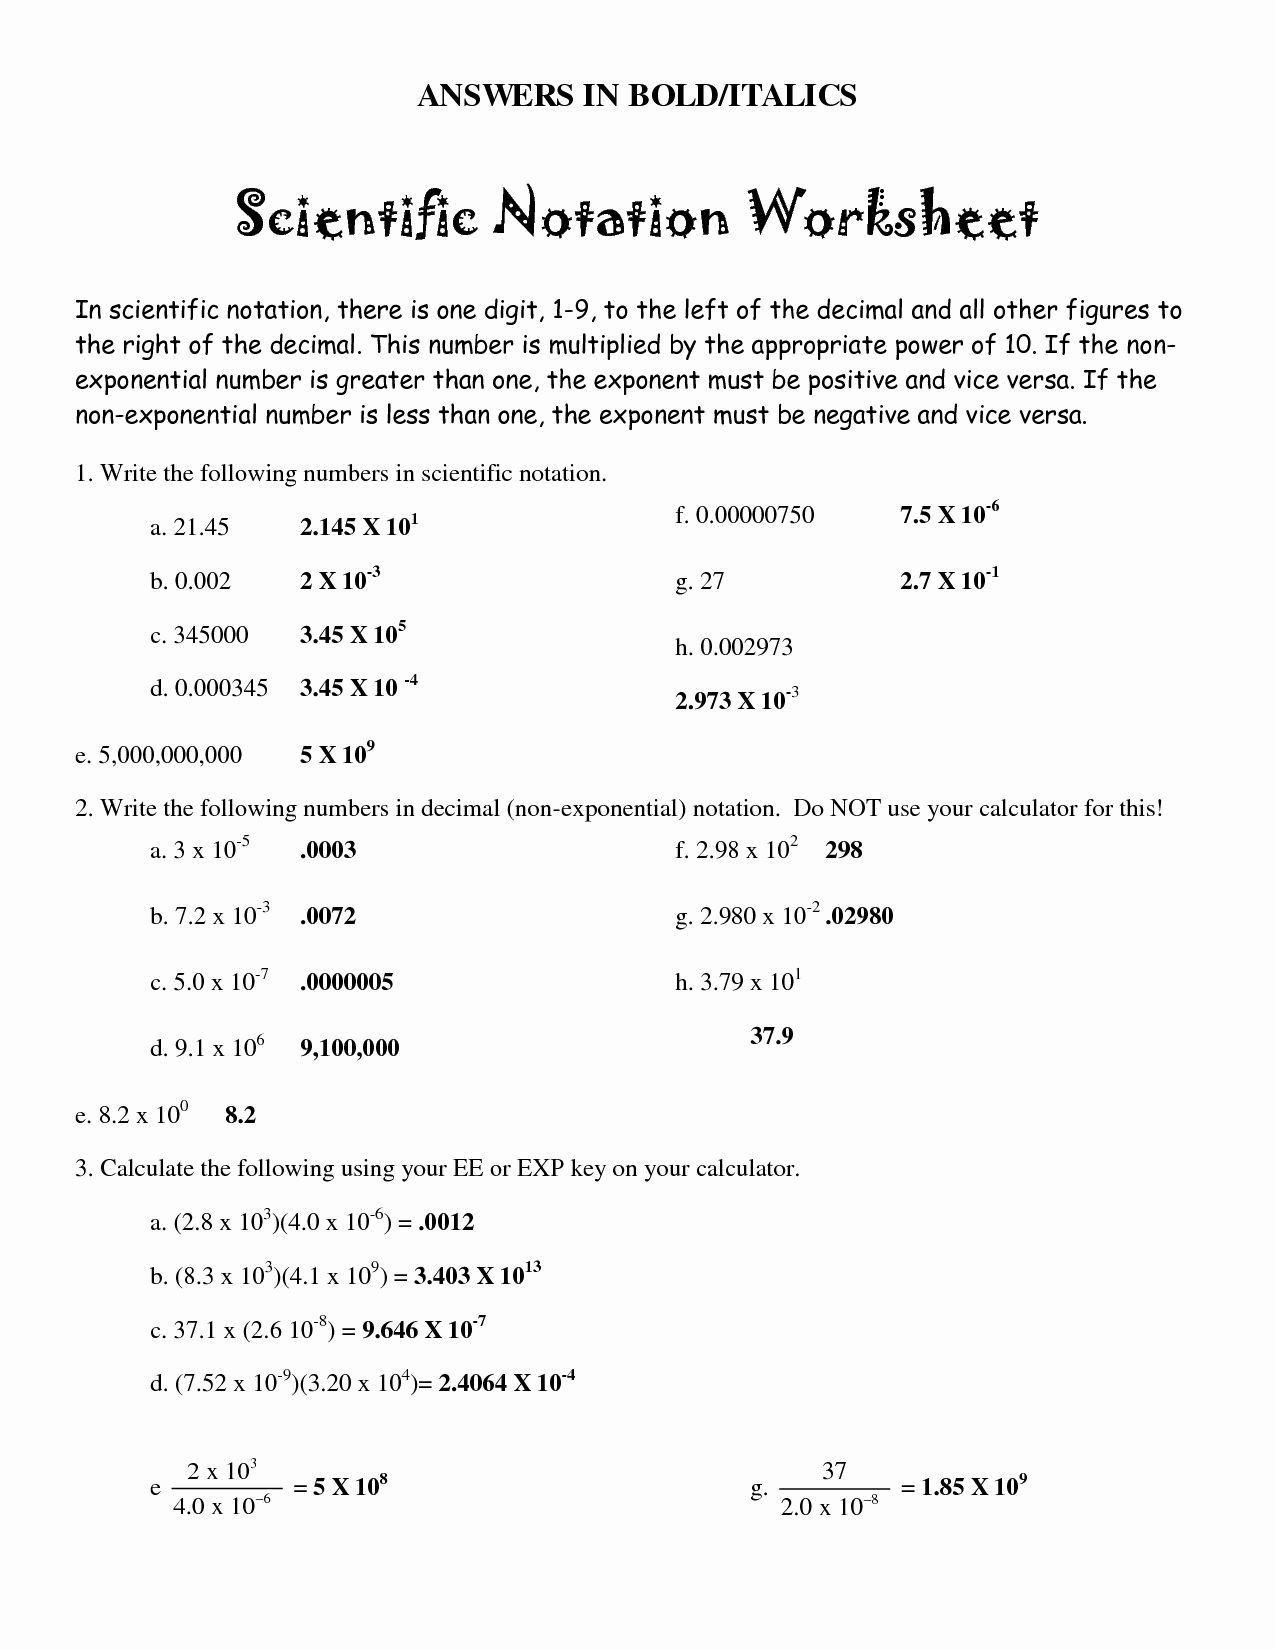 Scientific Notation Worksheet Answer Key Scientific Notation Worksheet With In 2020 Scientific Notation Word Problems Scientific Notation Scientific Notation Worksheet